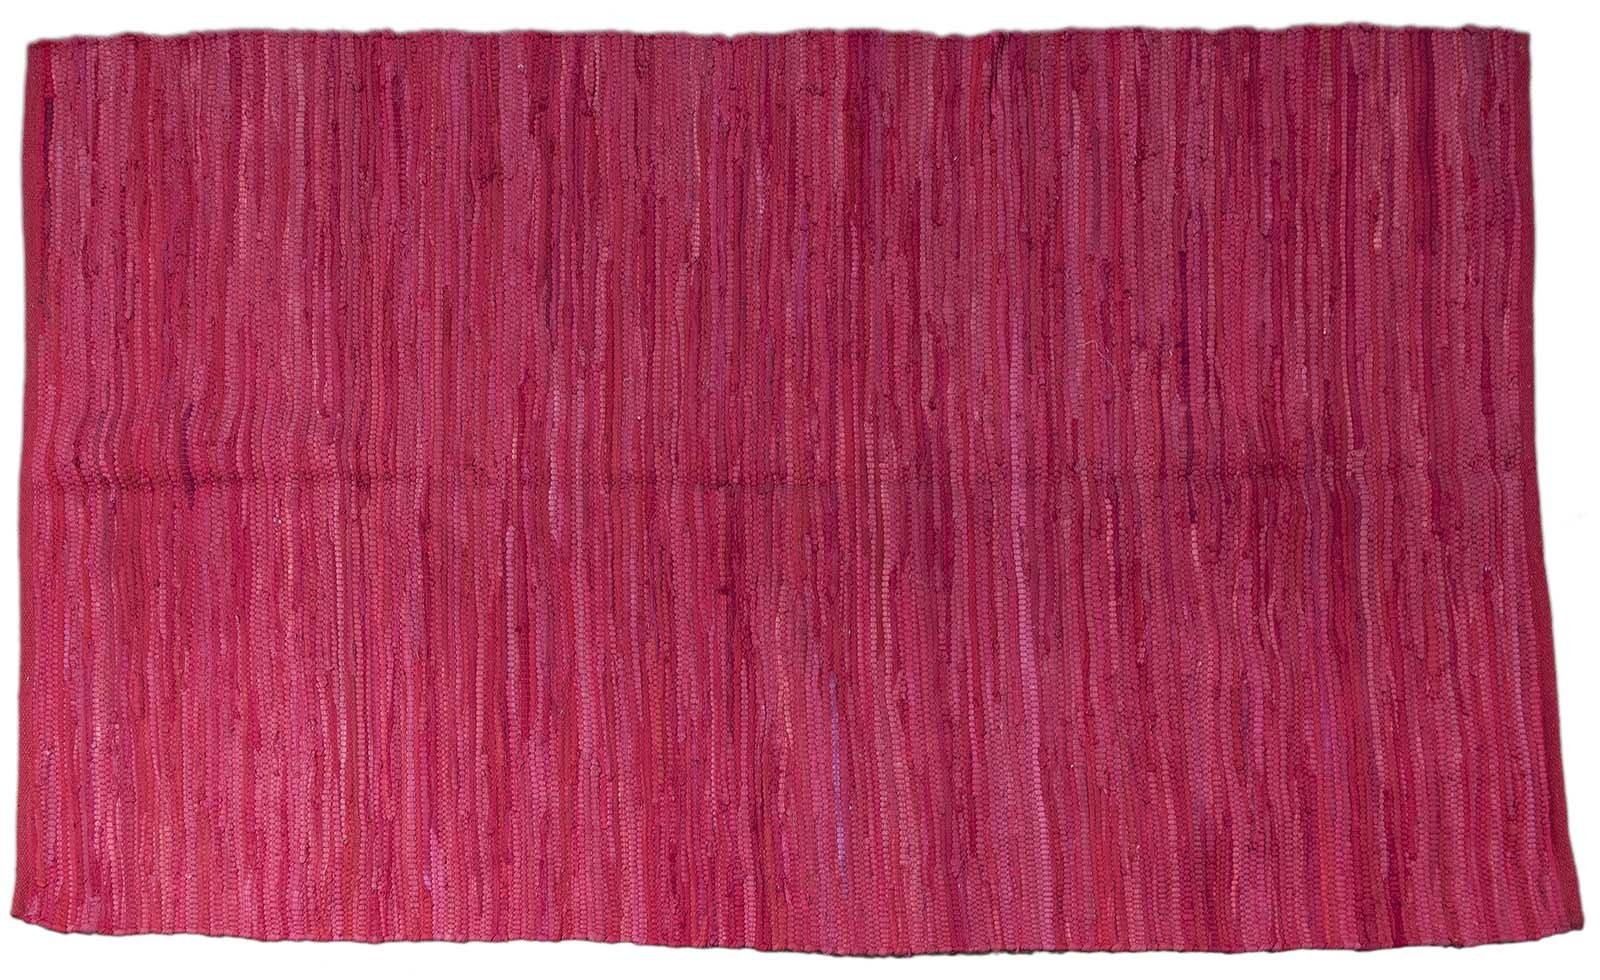 Tappeti In Tessuto Naturale : Turco pavimento zona tappeto tappeto di lana naturale tessuti a